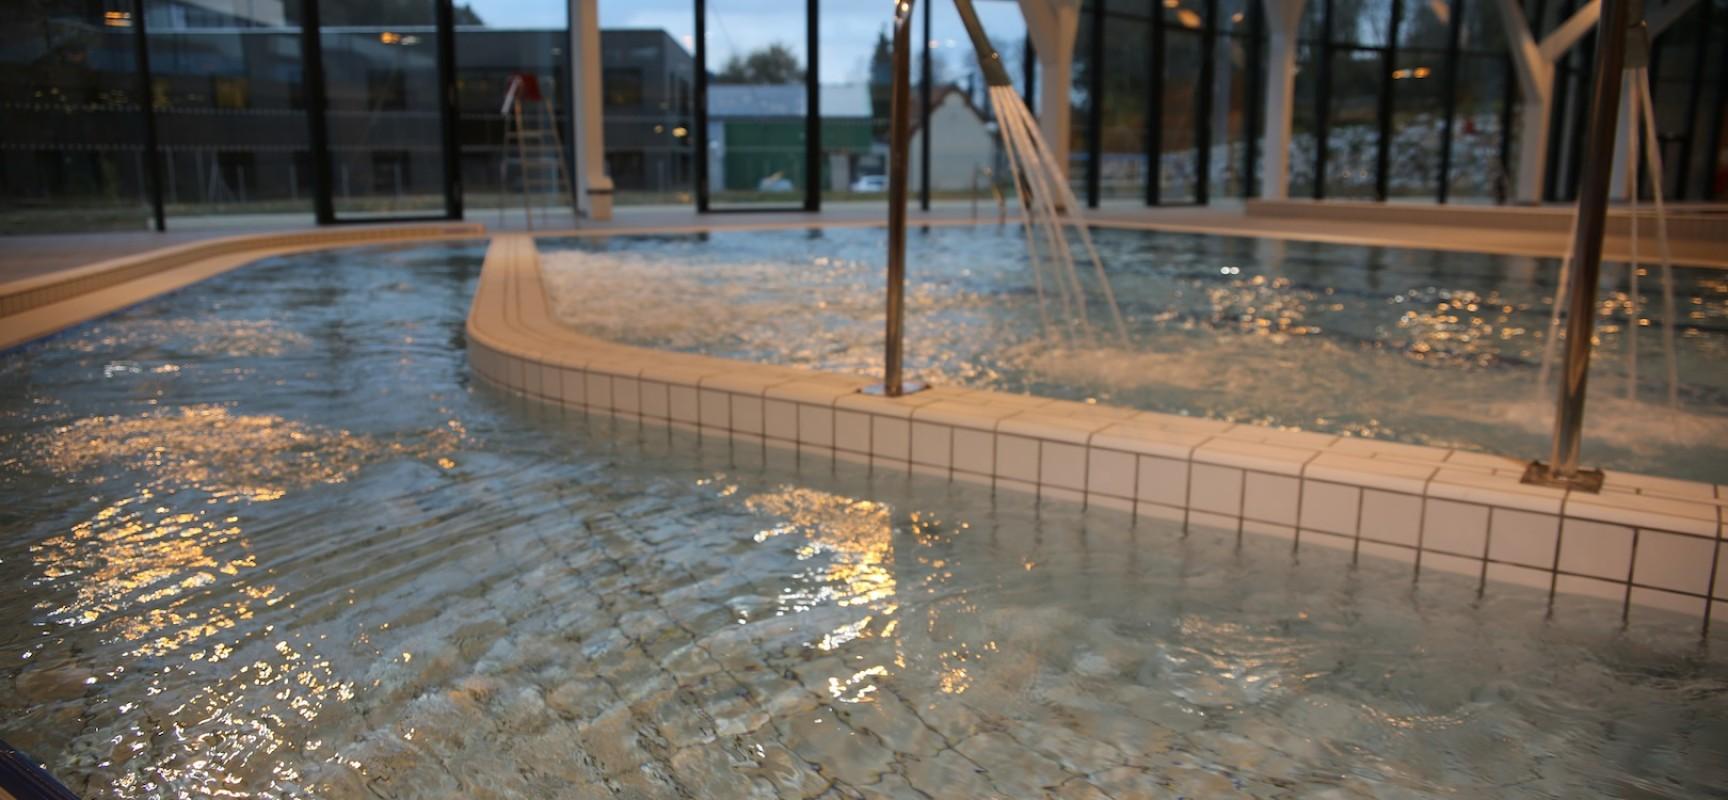 Ouverture de la piscine intercommunale creuse grand sud for Ouverture piscine